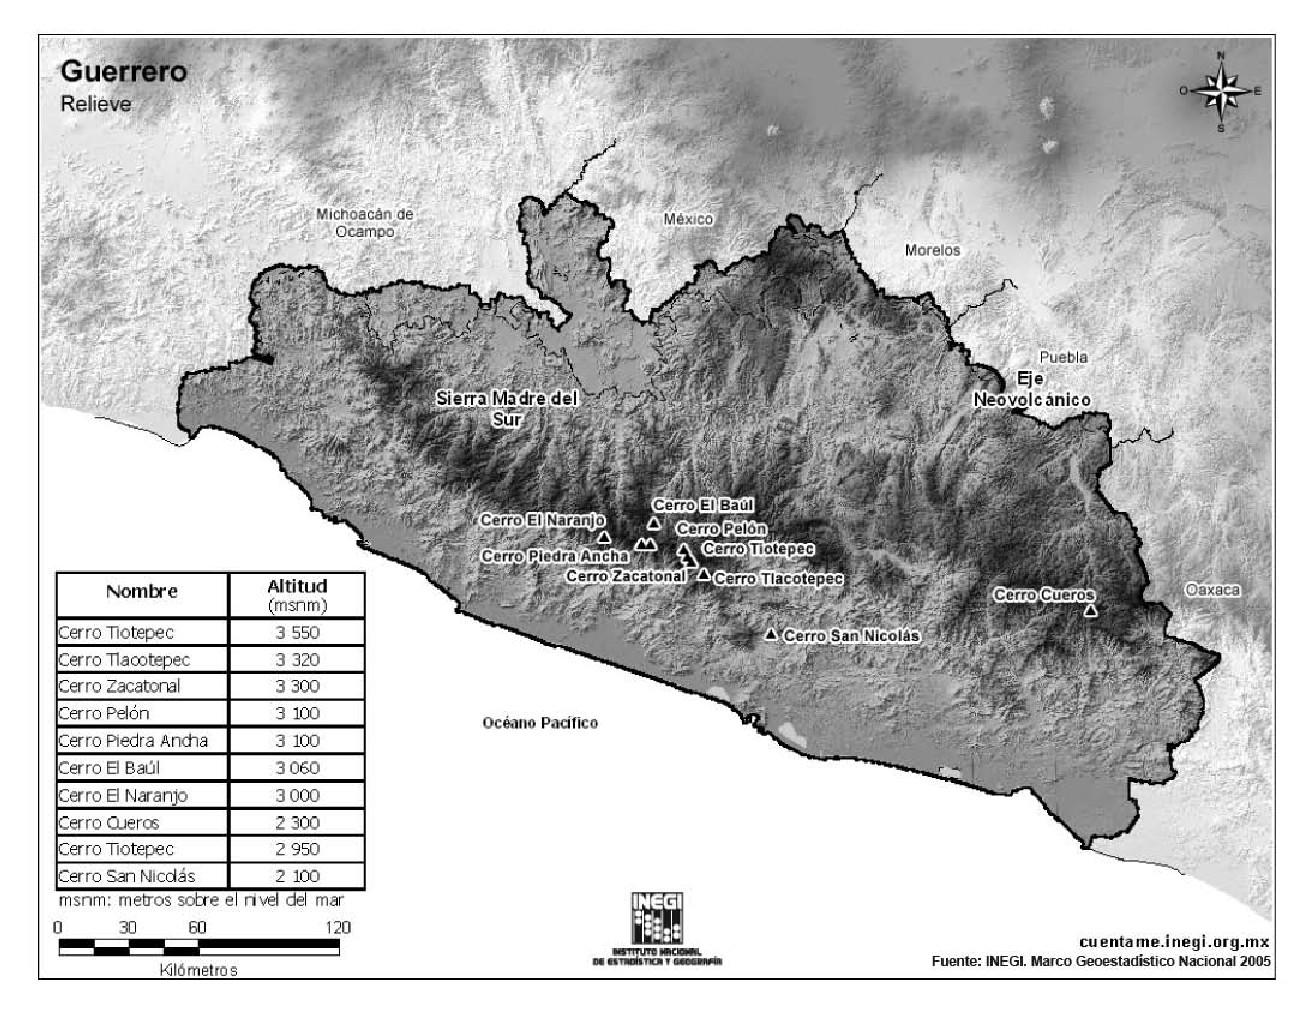 Mapa de montañas de Guerrero. INEGI de México